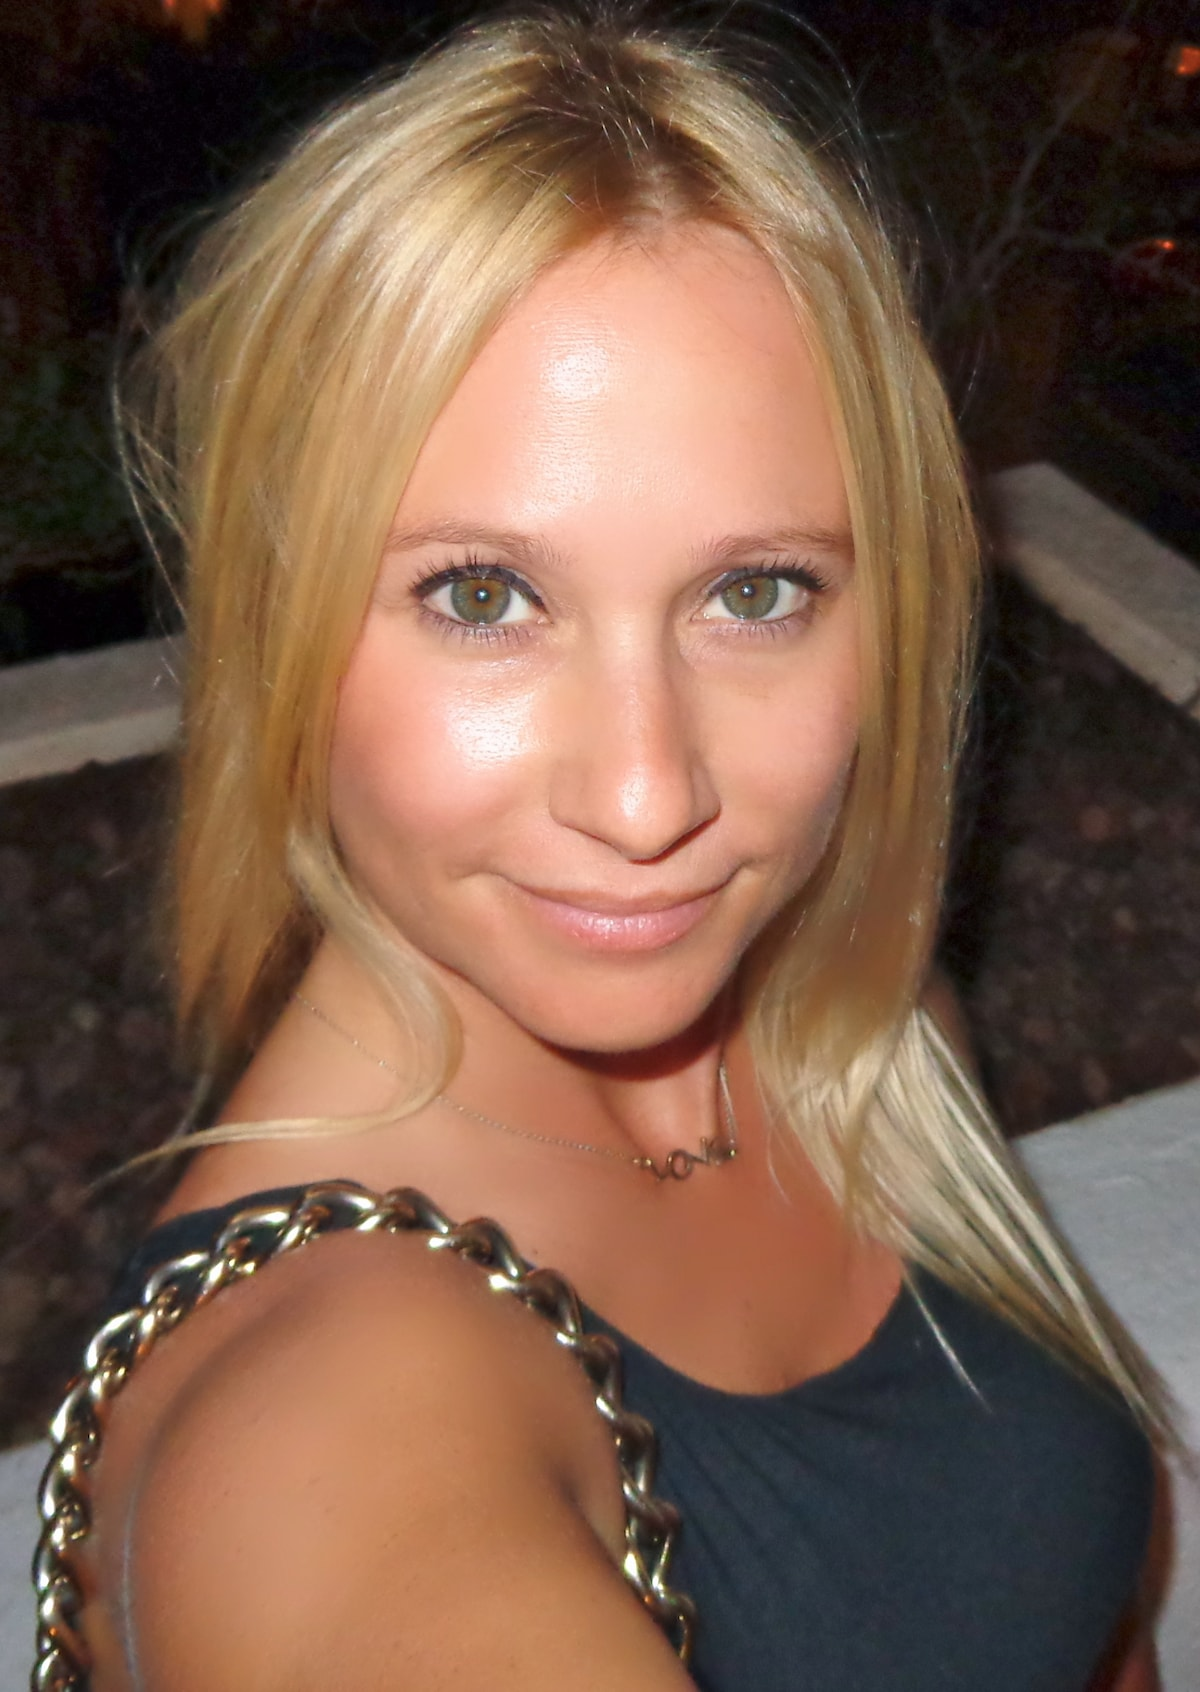 Tara From Collaroy, Australia